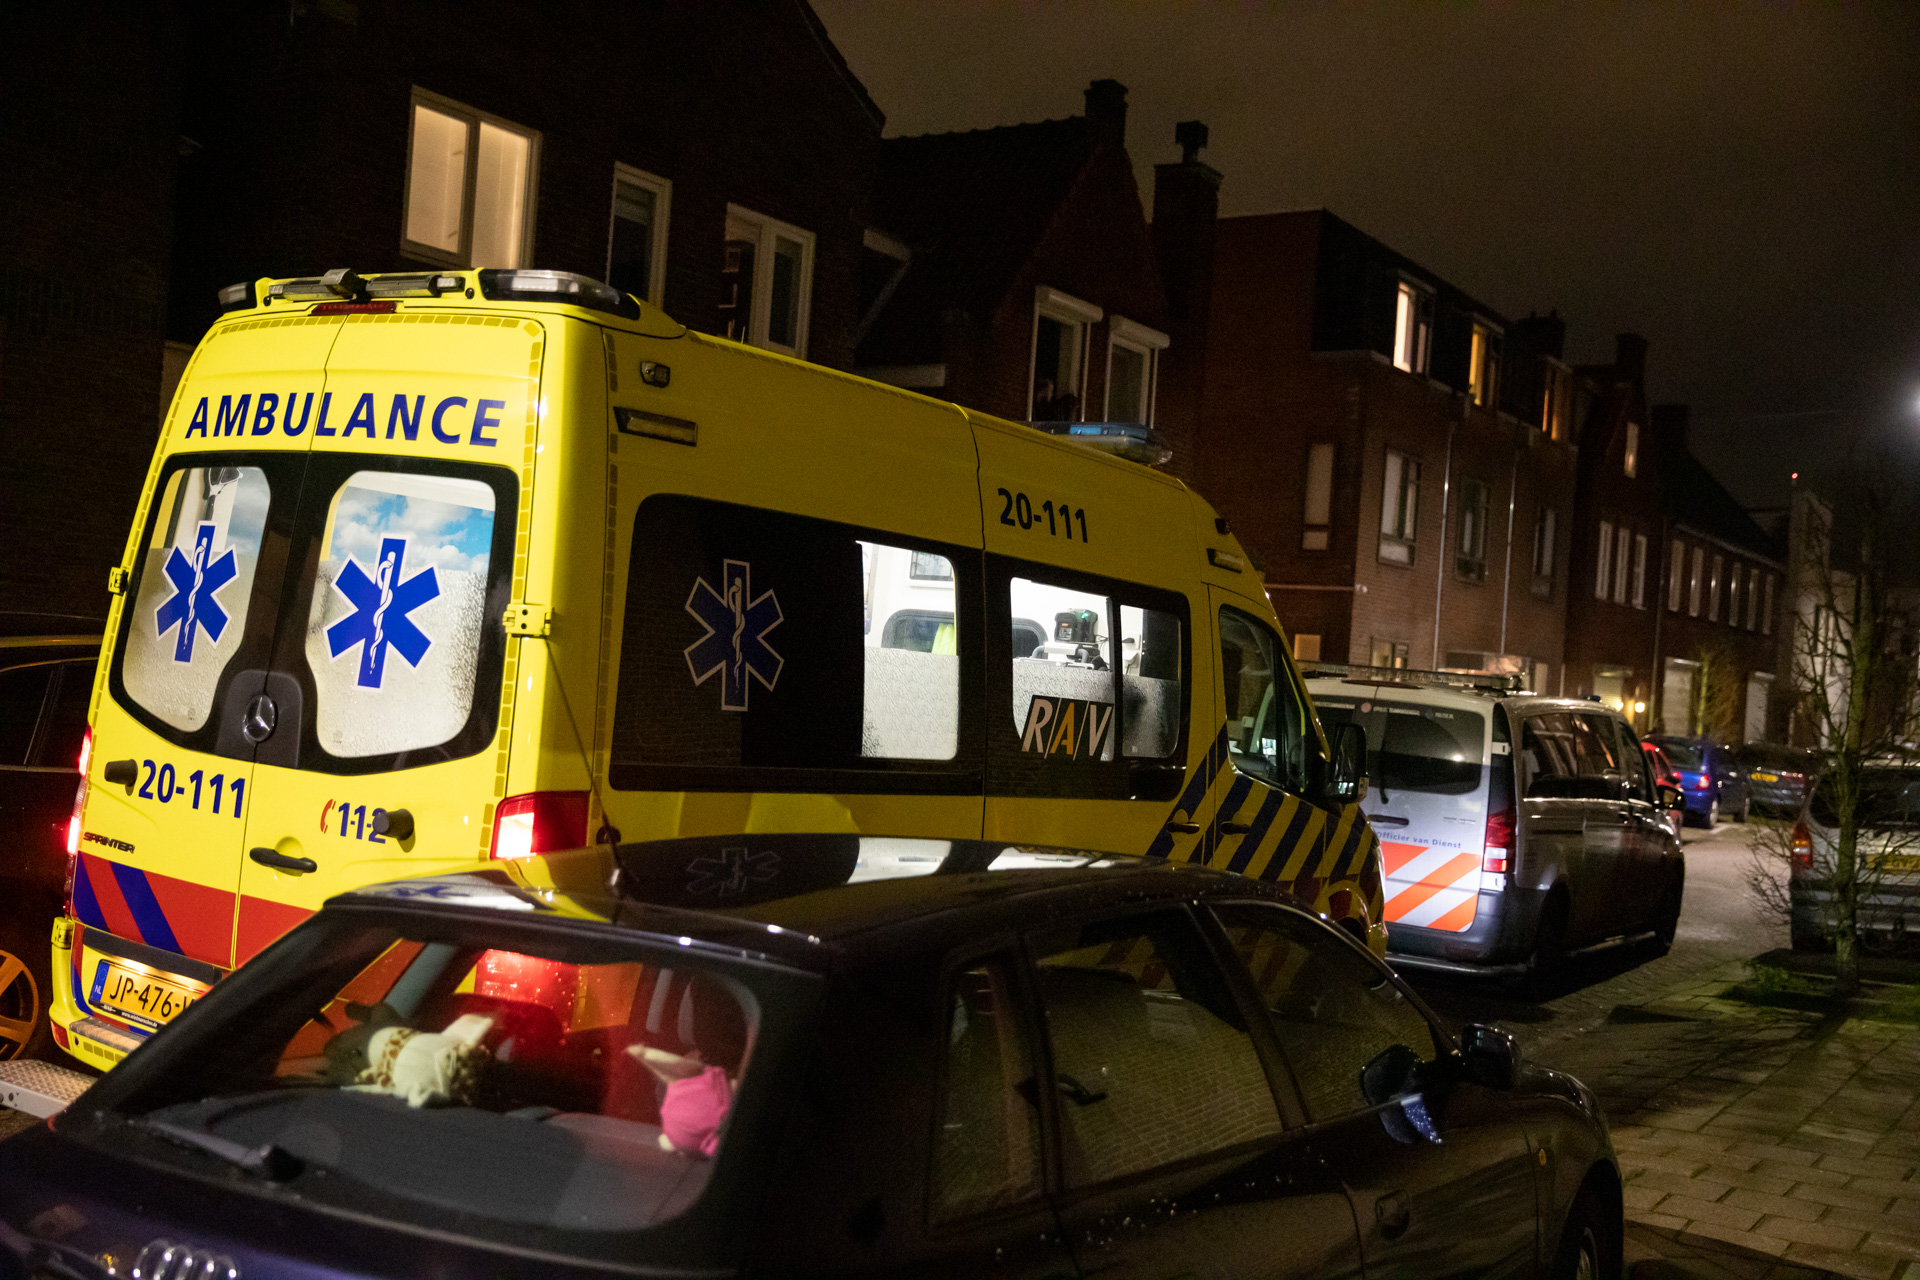 Man gestoken en geslagen in woning Damstraat, dader aangehouden